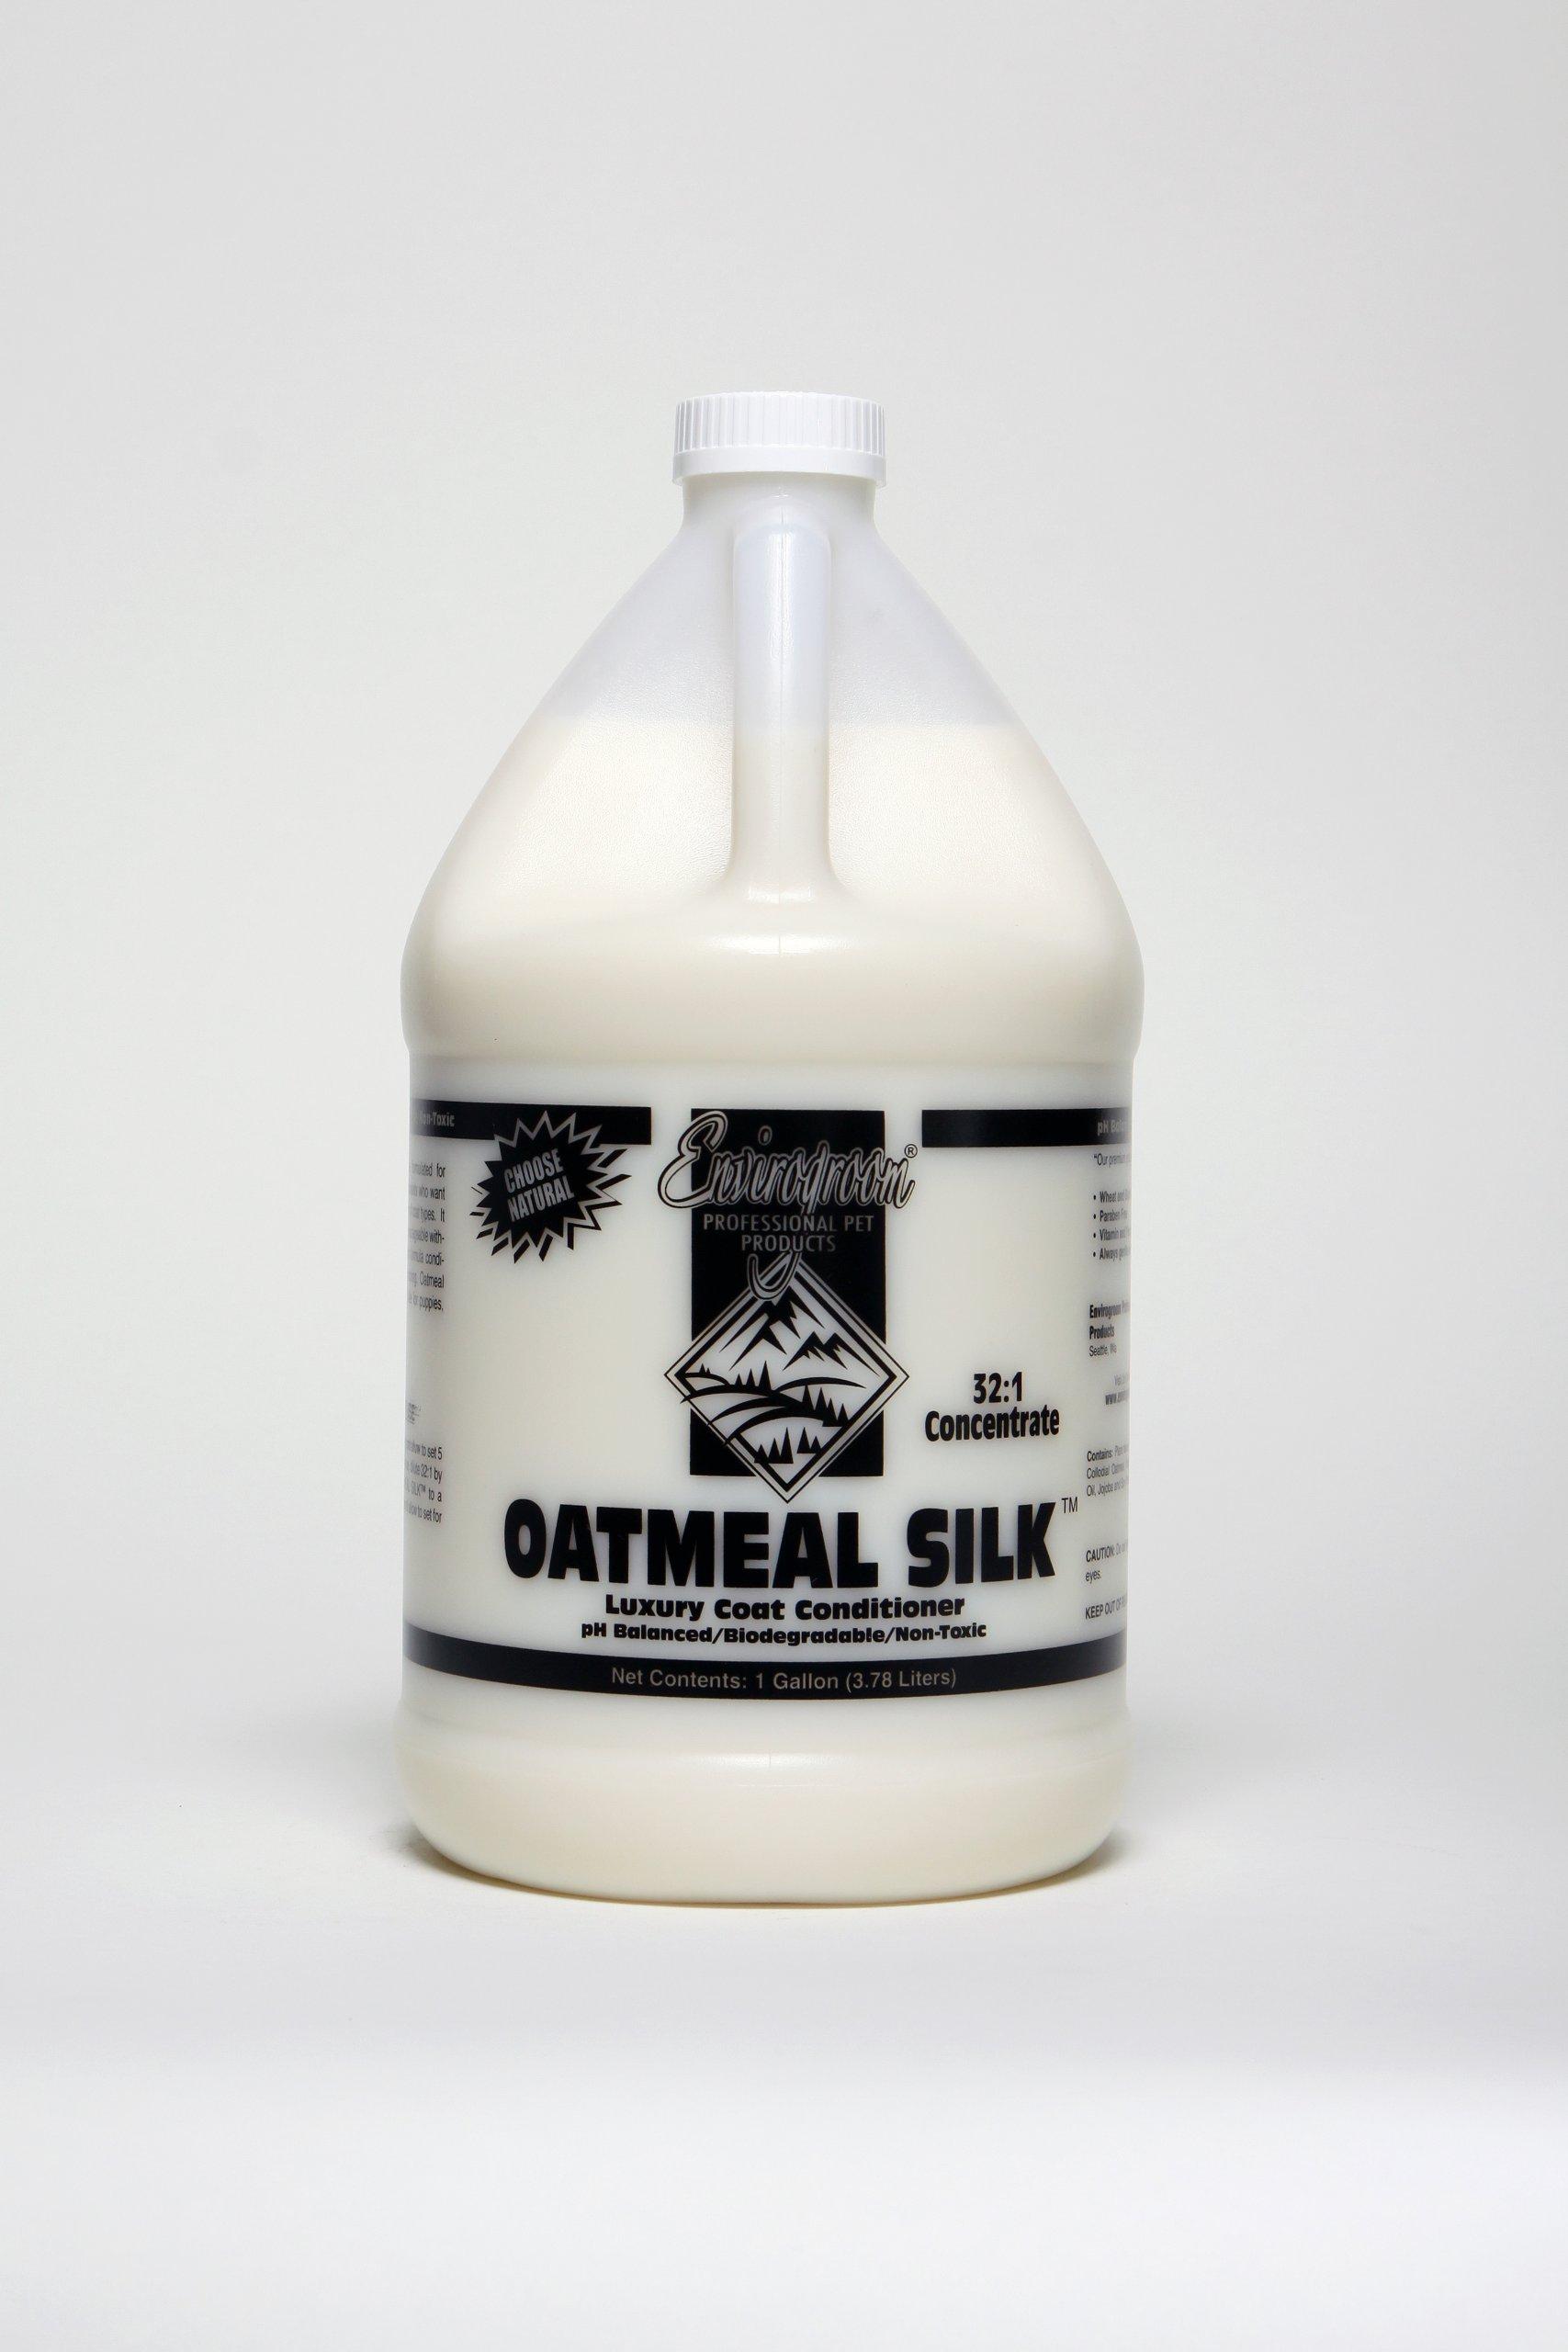 Envirogroom Oatmeal Silk Conditioner Gallon